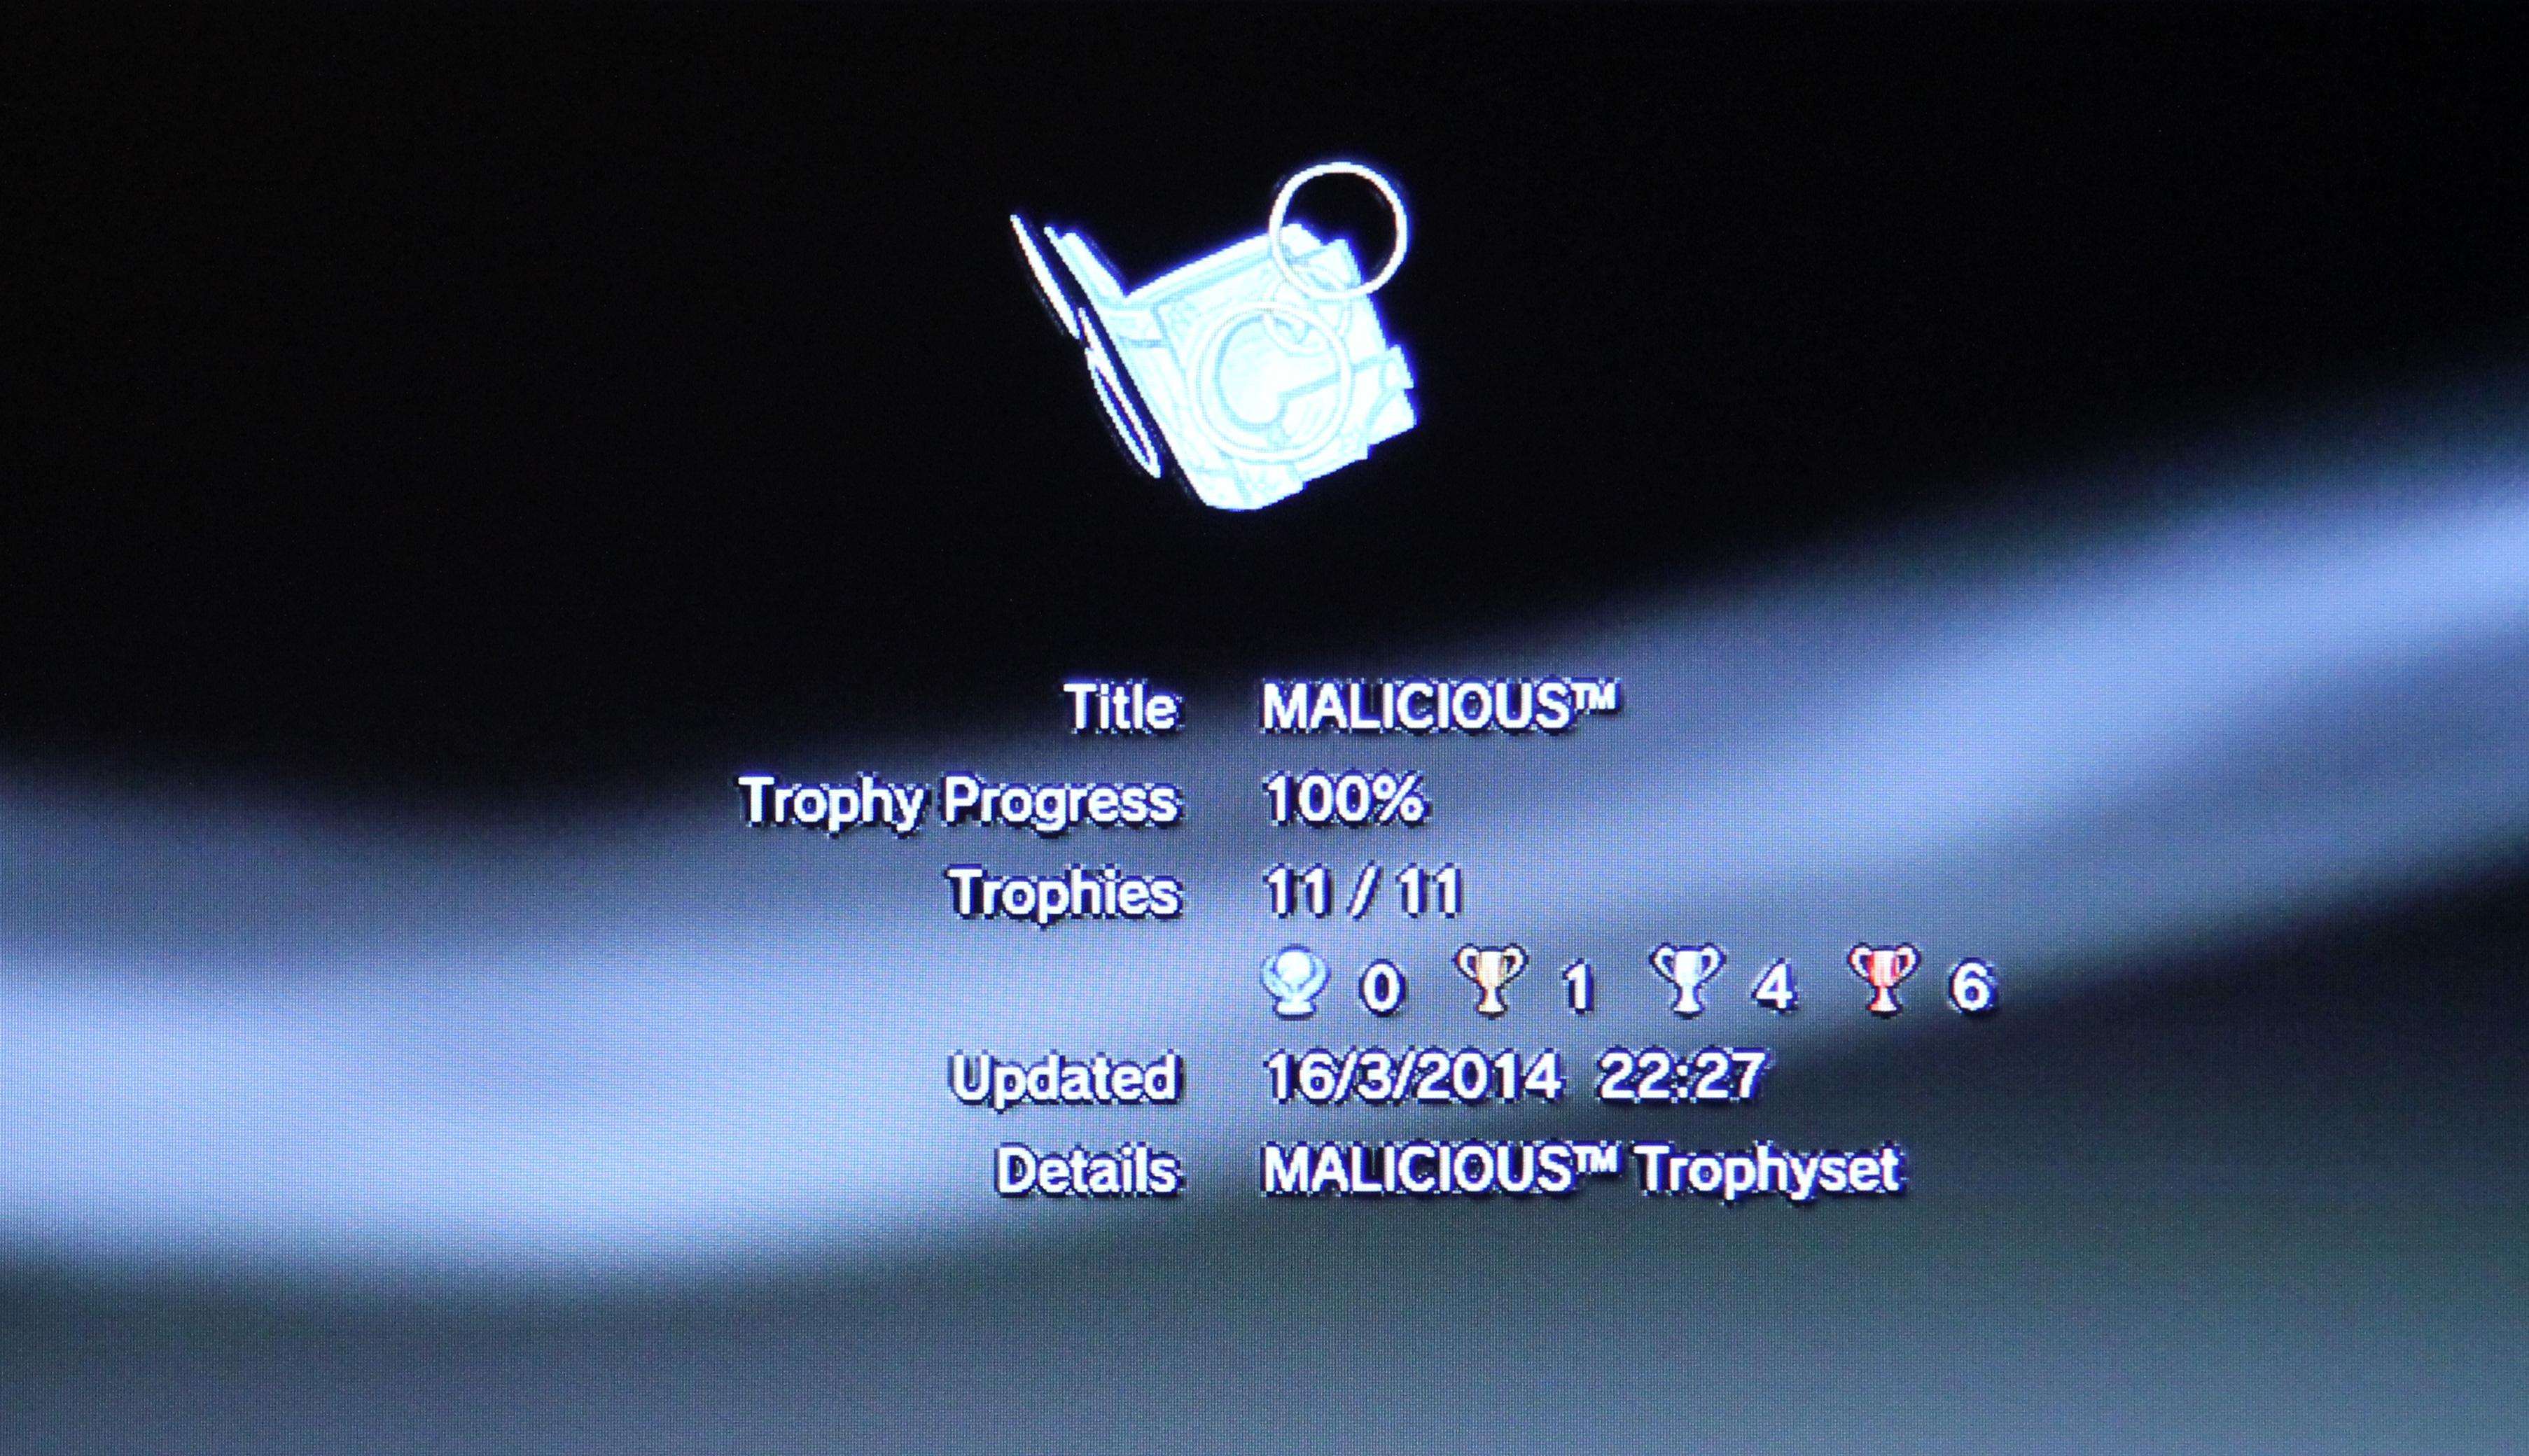 Malicious 100%